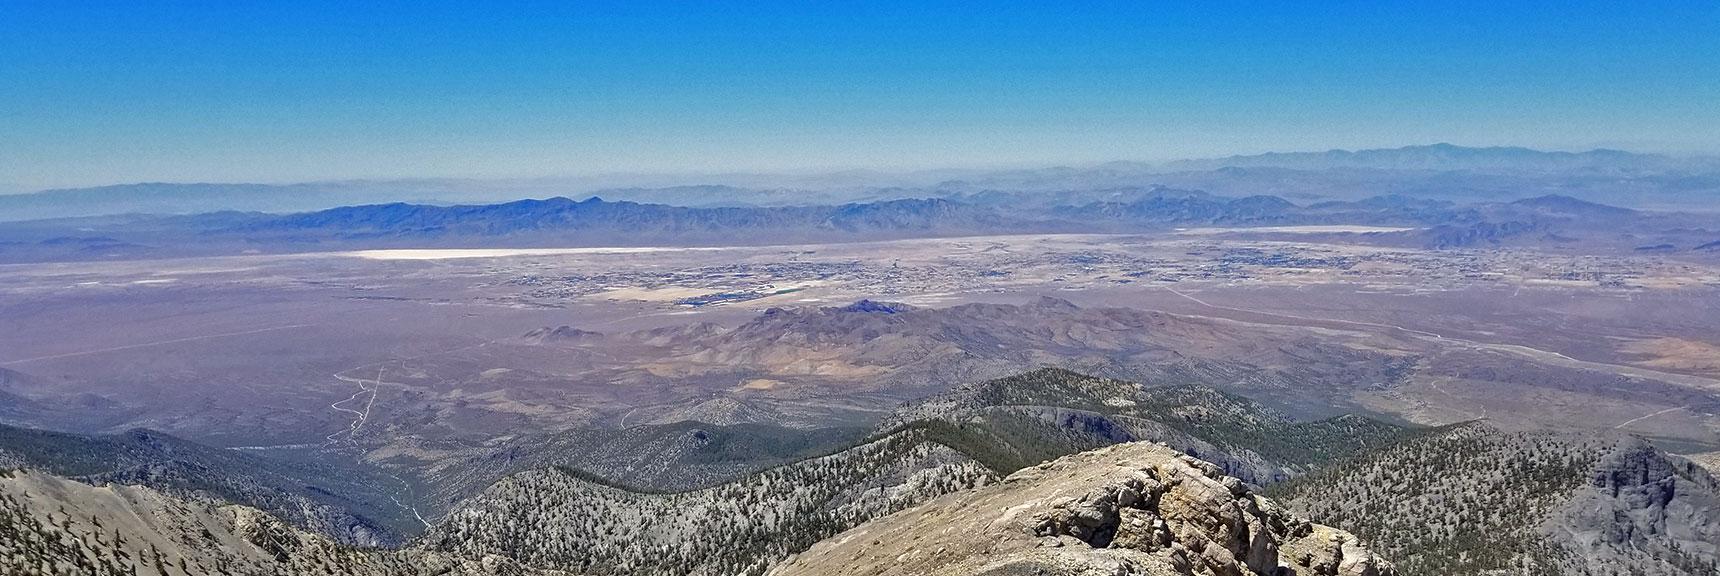 Pahrump with Telescope Peak in Background from Charleston Peak Summit | Griffith Peak & Charleston Peak Circuit Run, Spring Mountains, Nevada